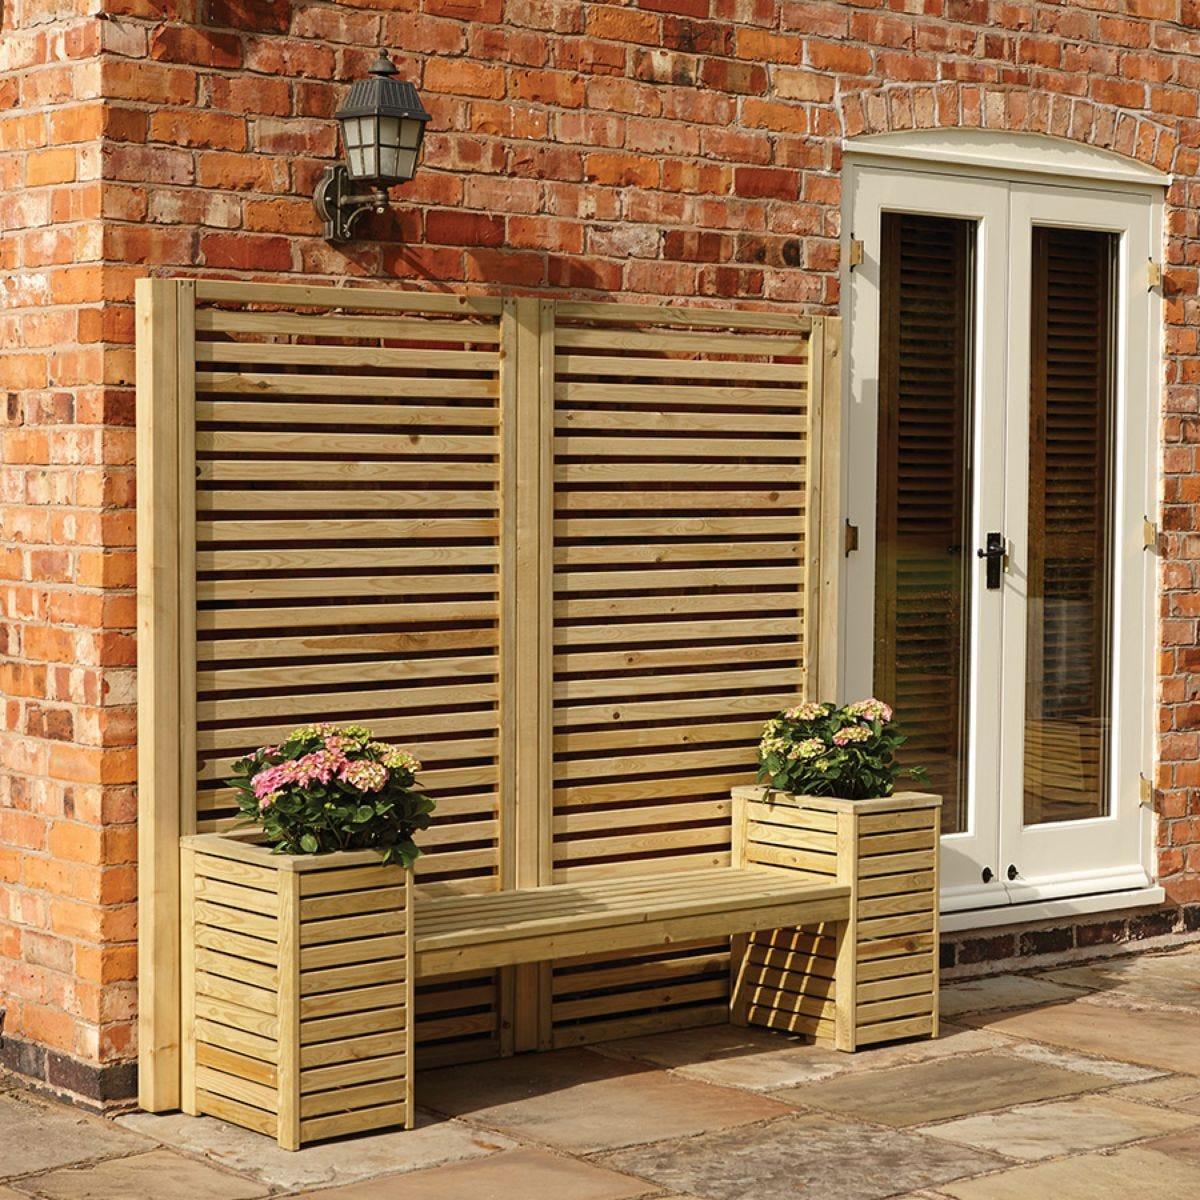 Rowlinson Garden Creations Seat Set